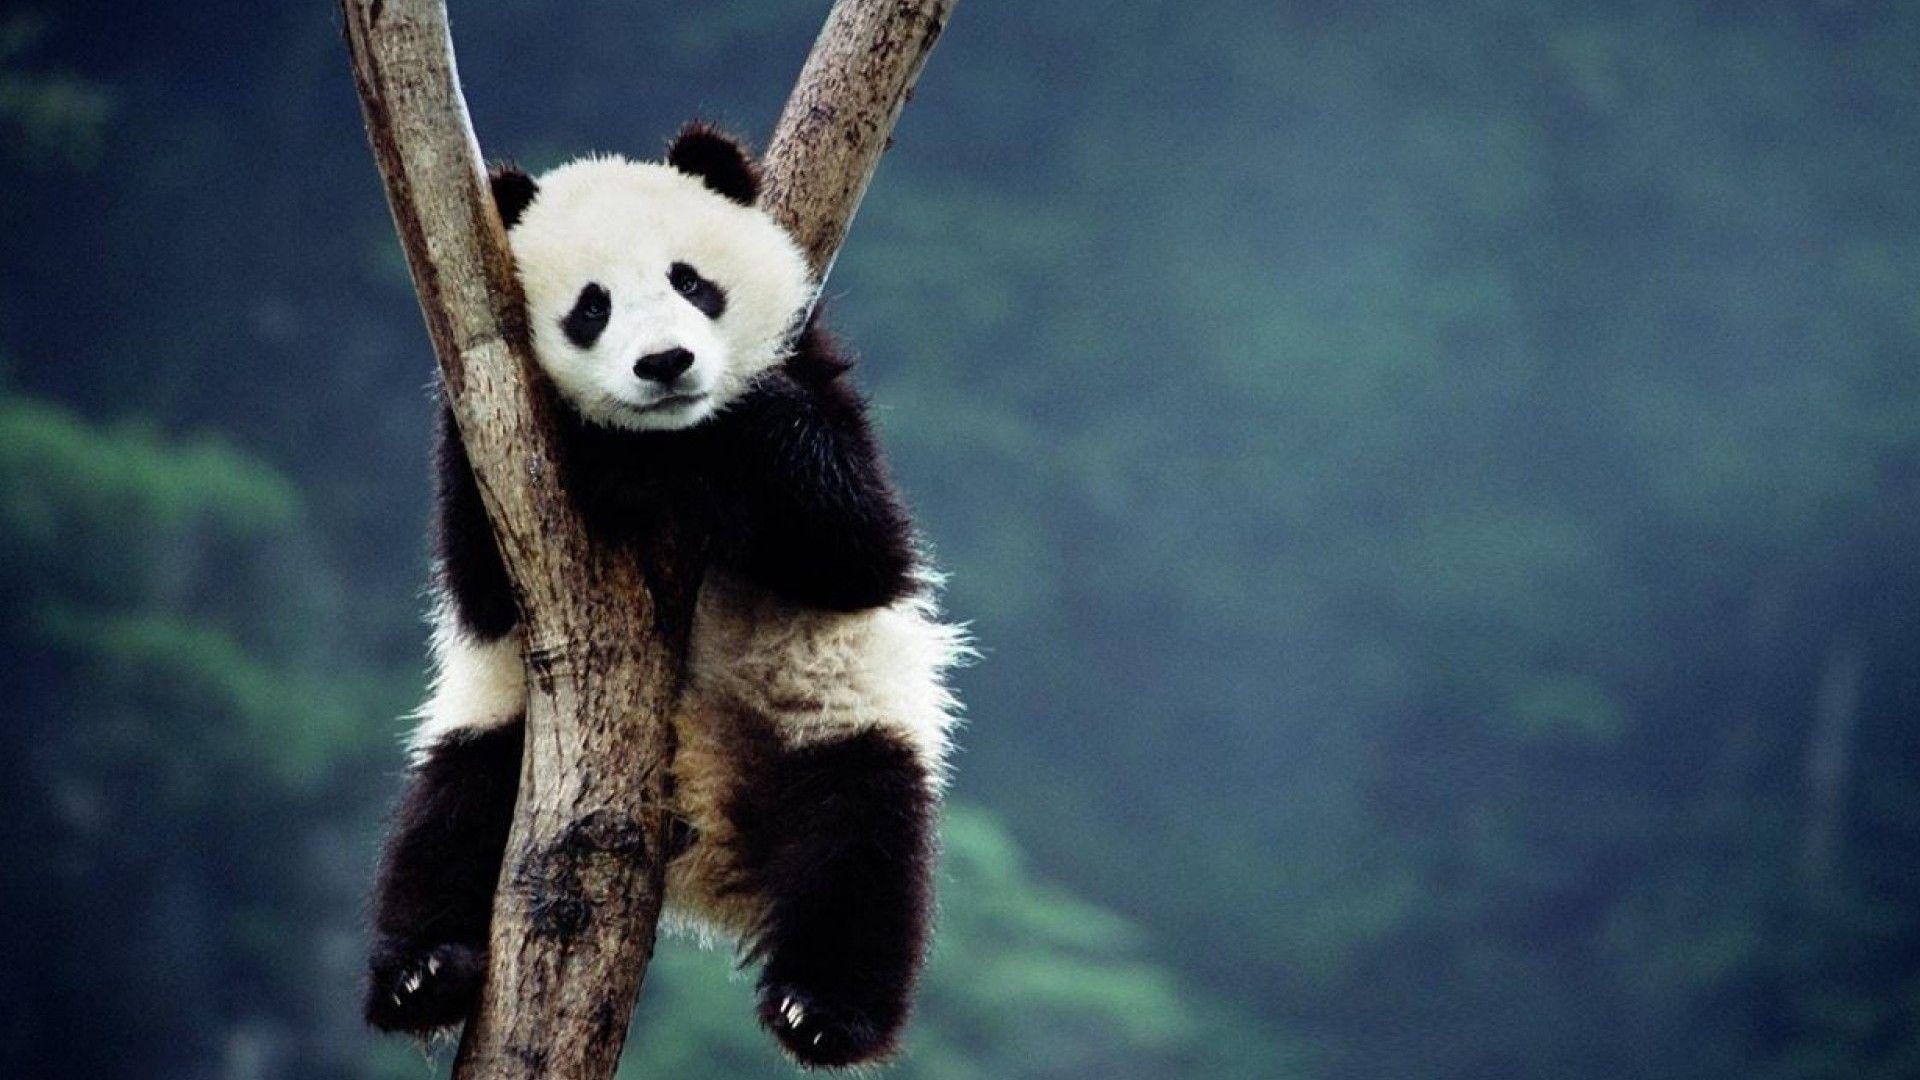 Cute Panda Pictures Wallpaper Hd 2021 Live Wallpaper Hd Panda Wallpapers Panda Bear Animal Wallpaper